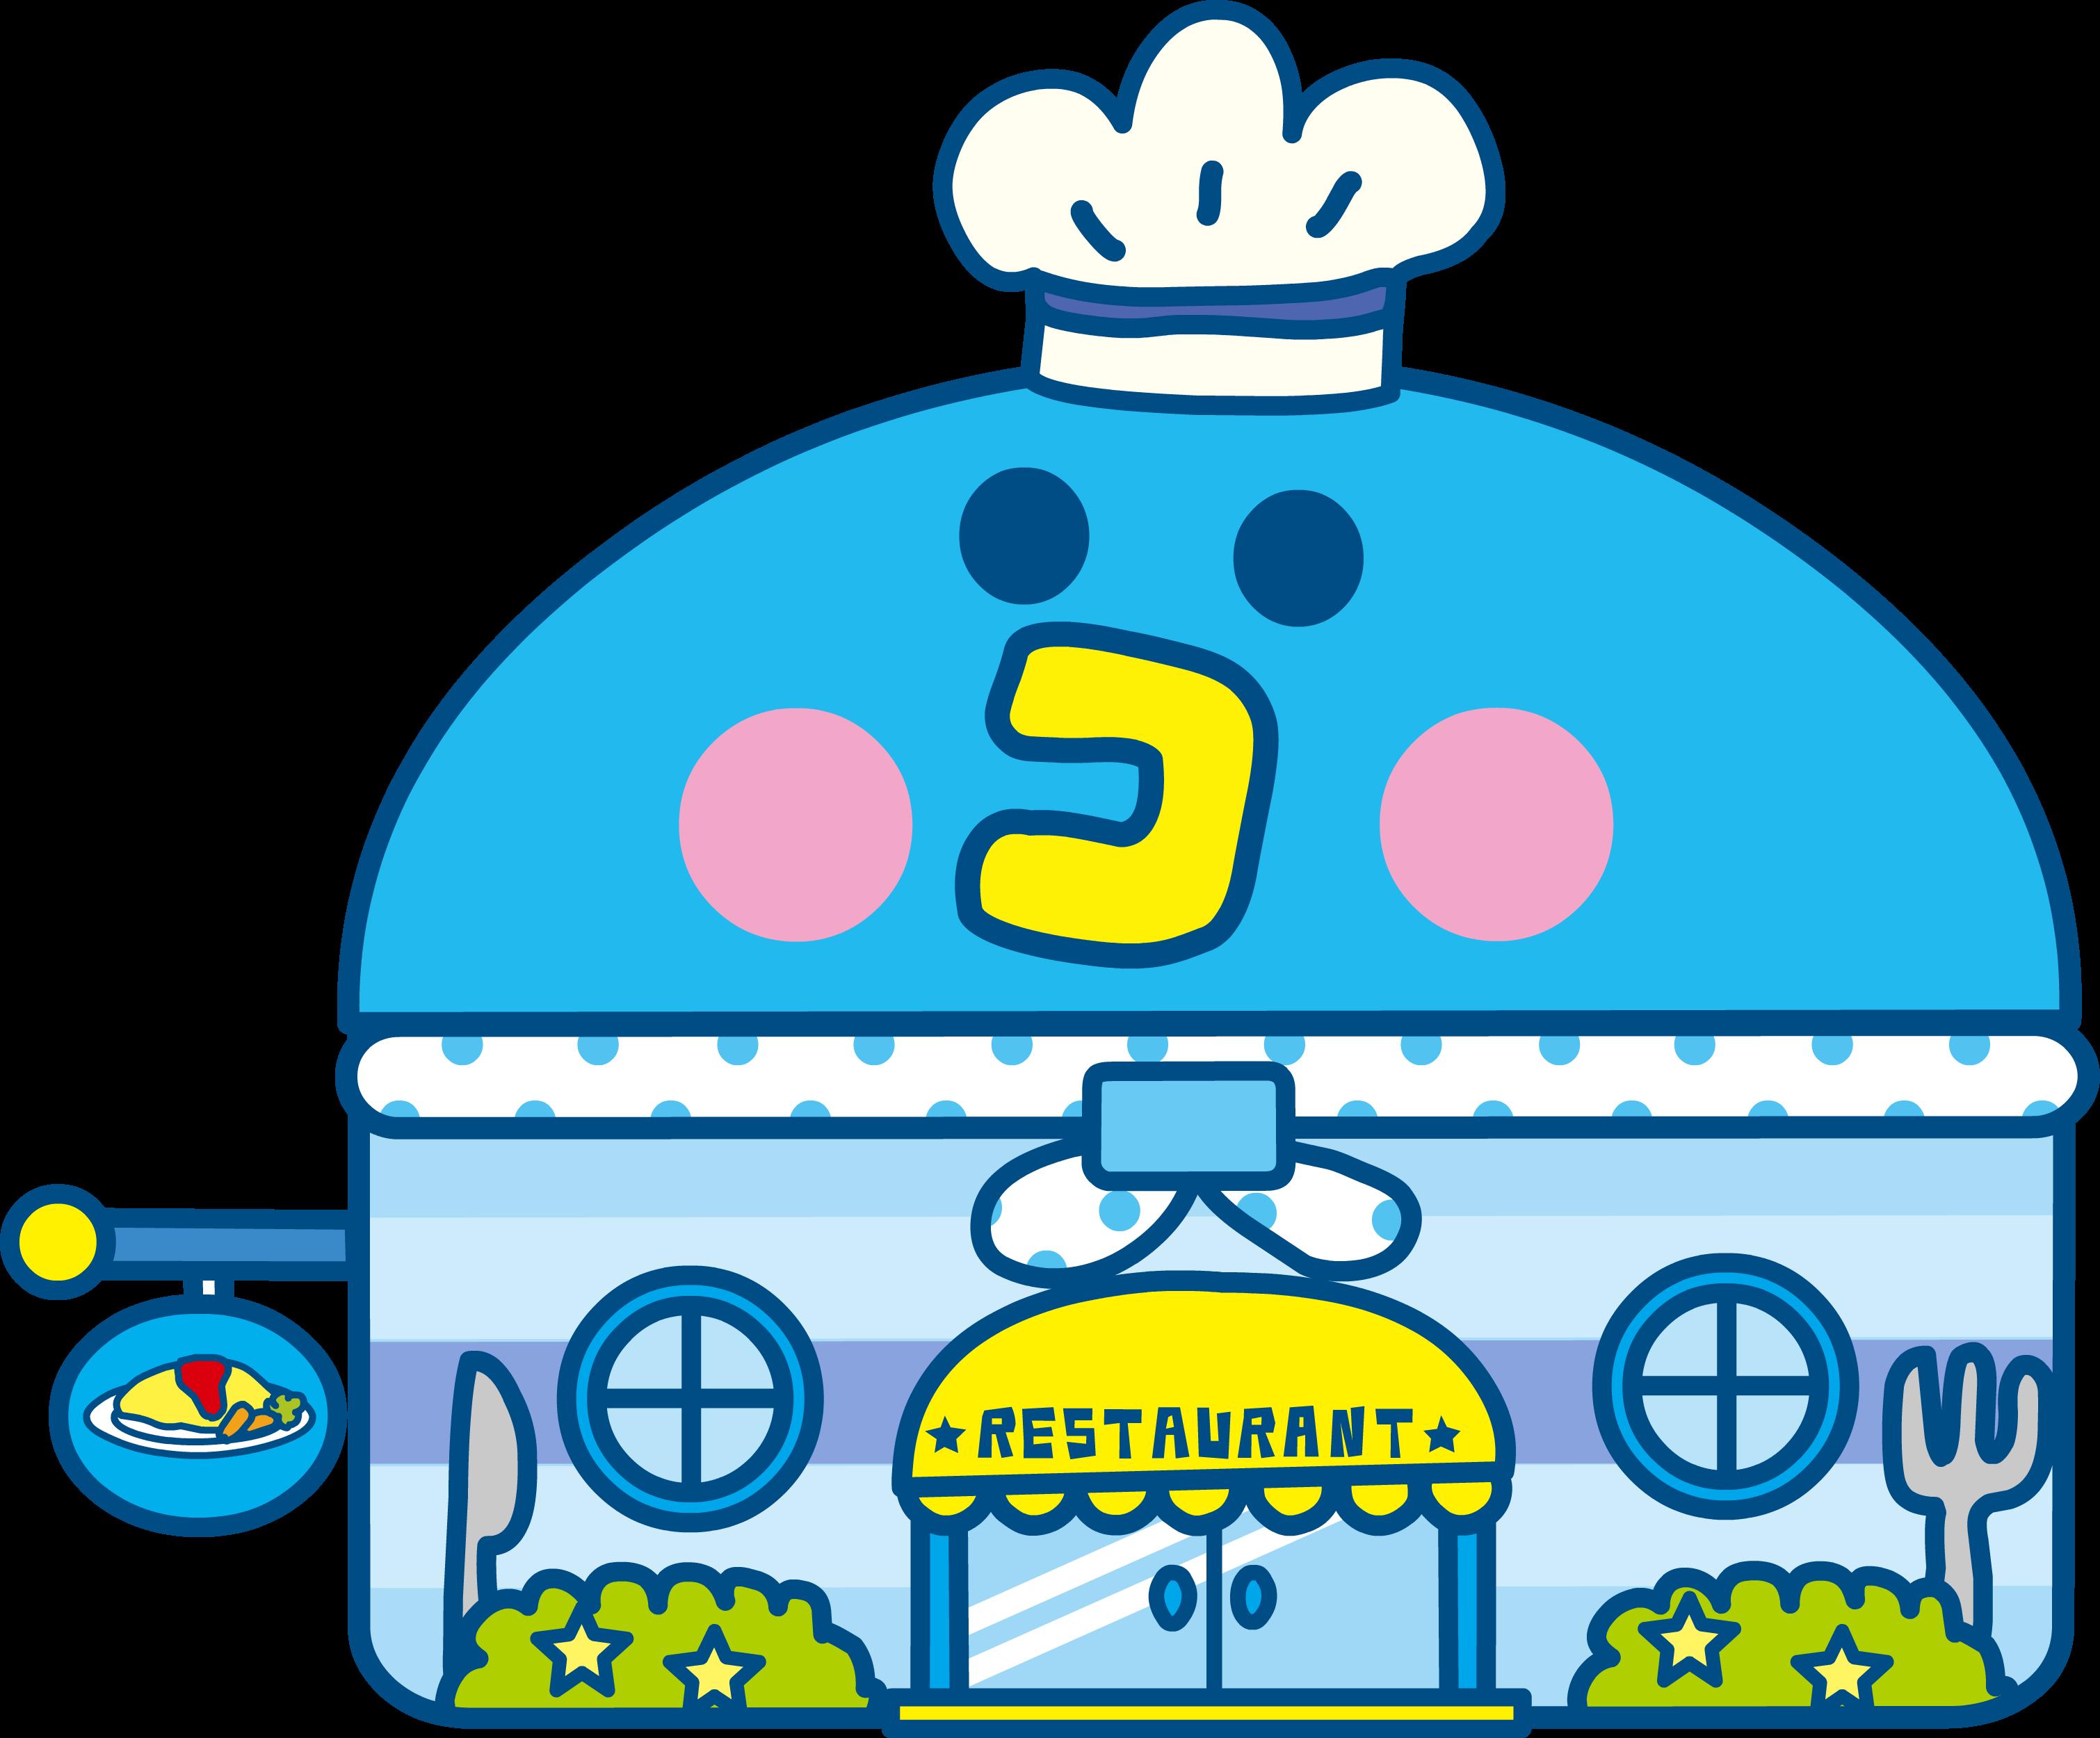 Tamagotchi Restaurant